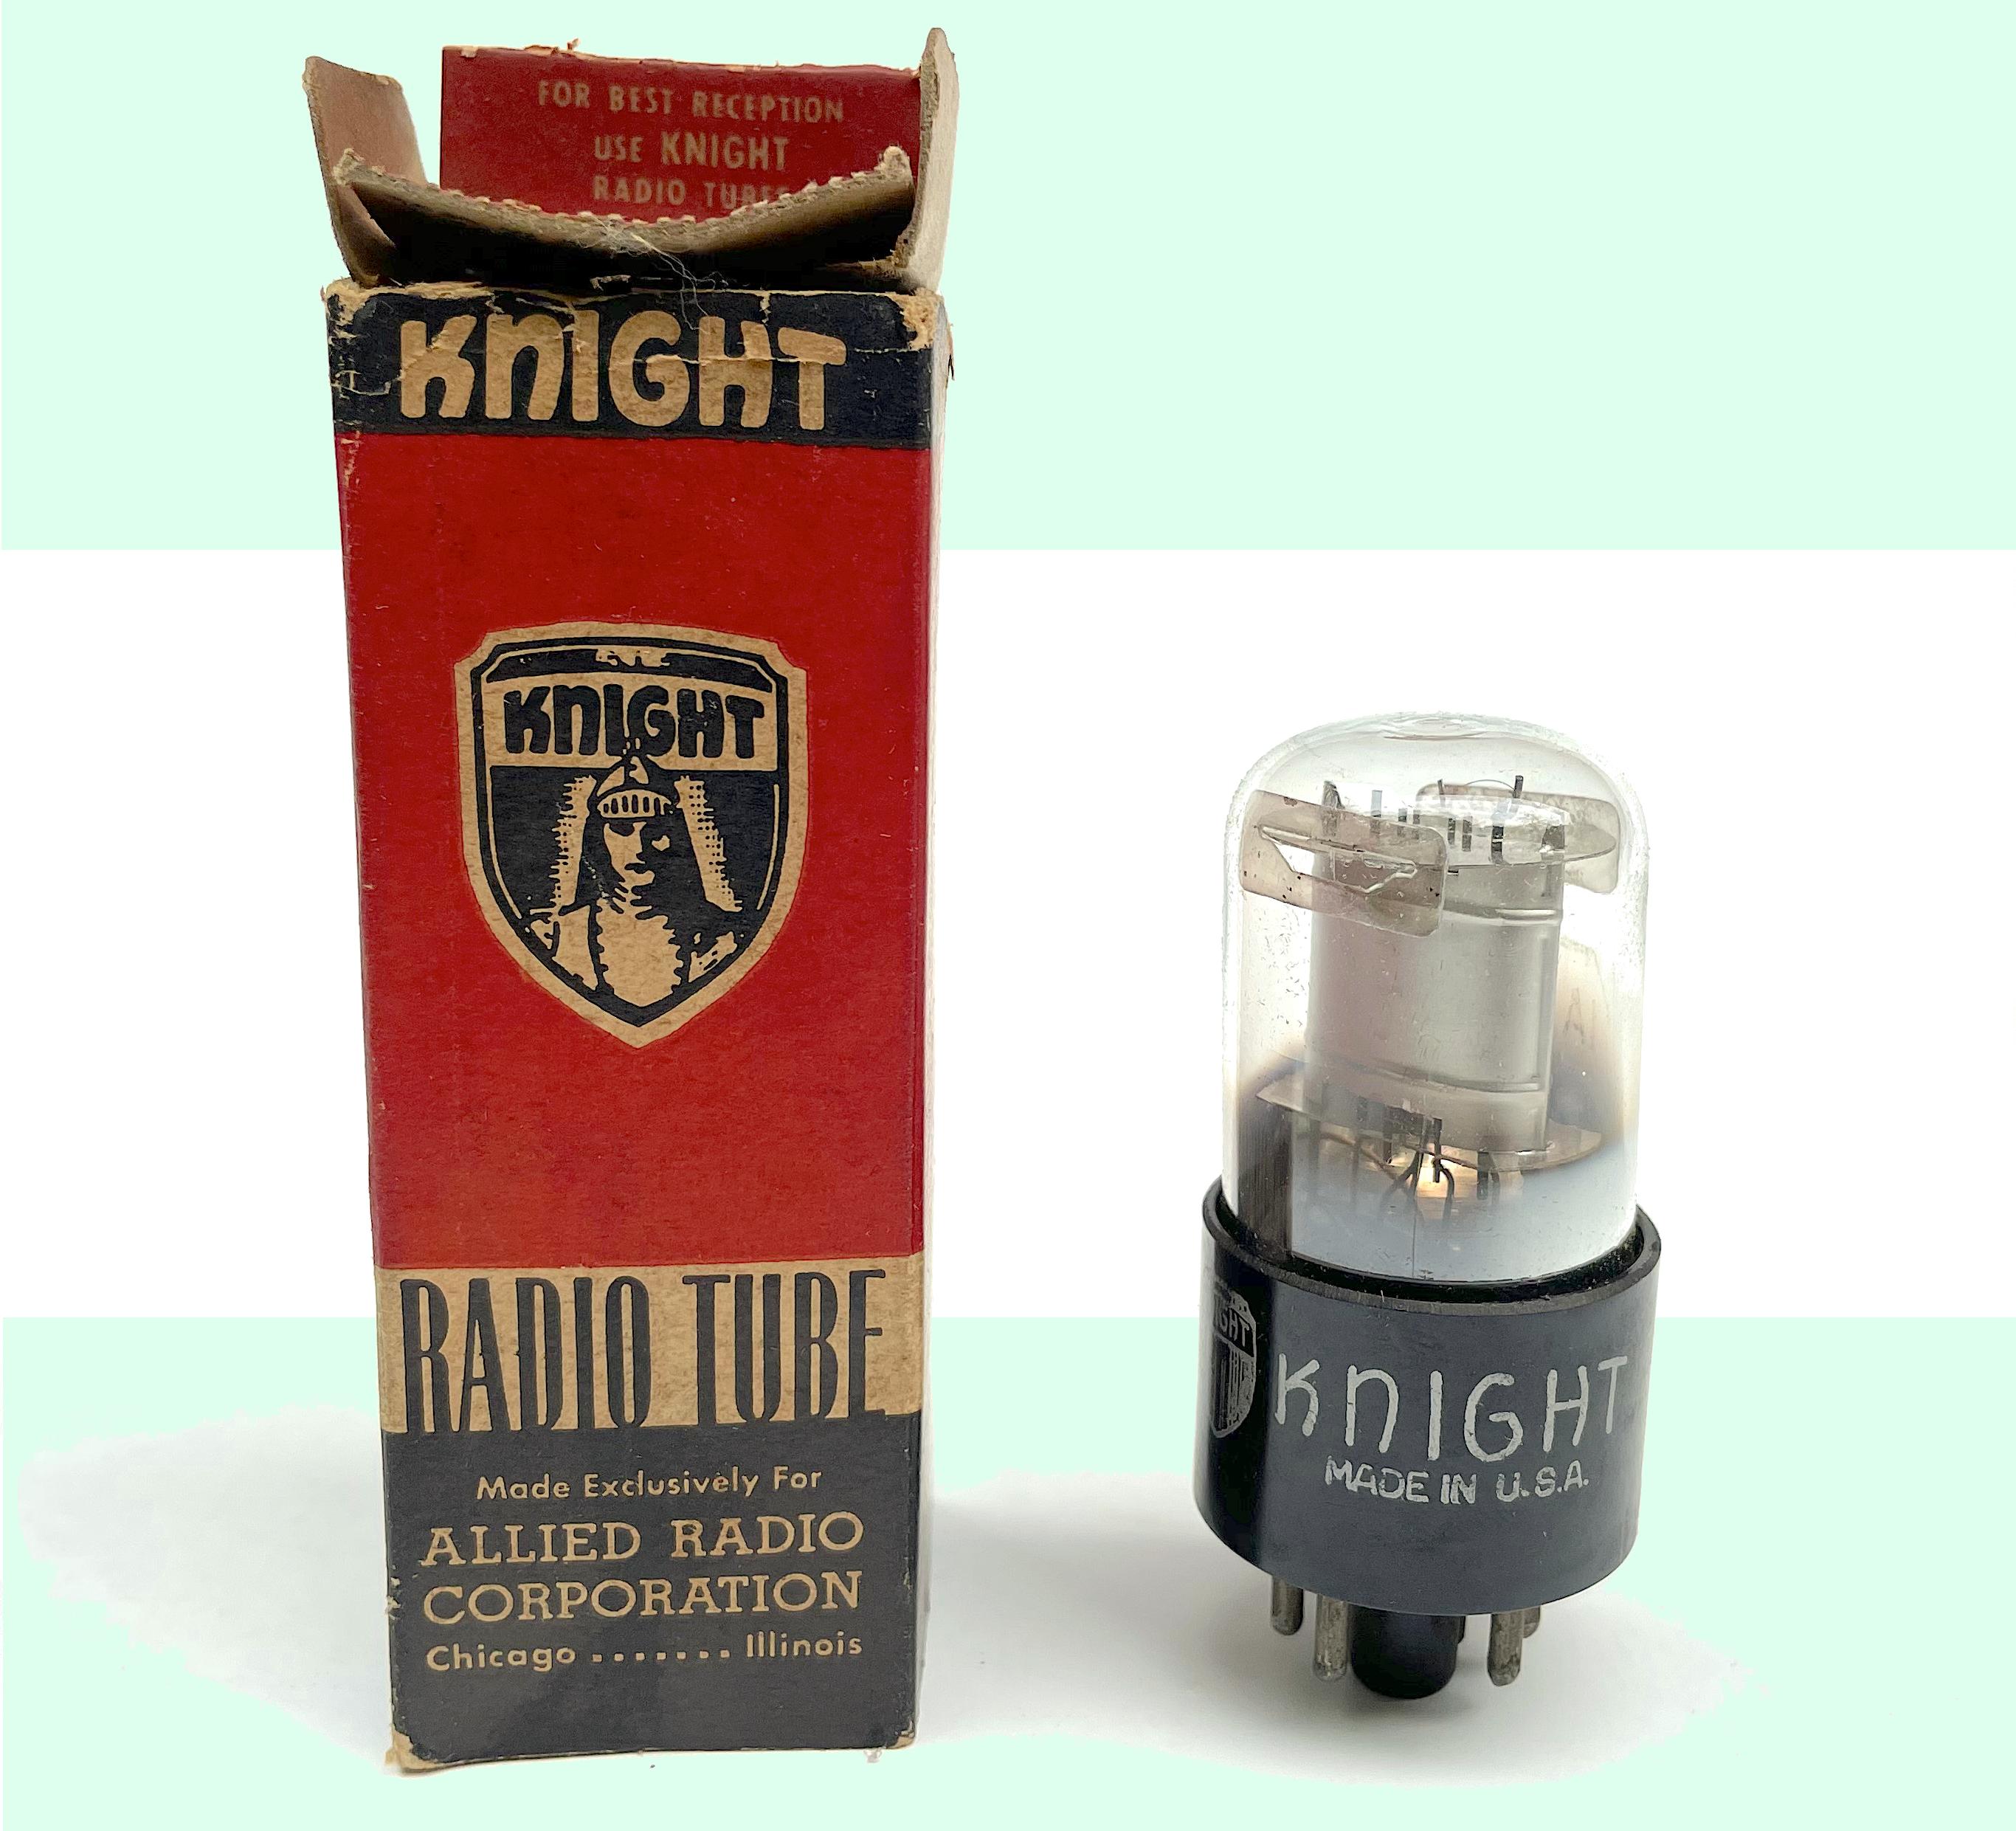 Allied Radio Corp., est. 1928